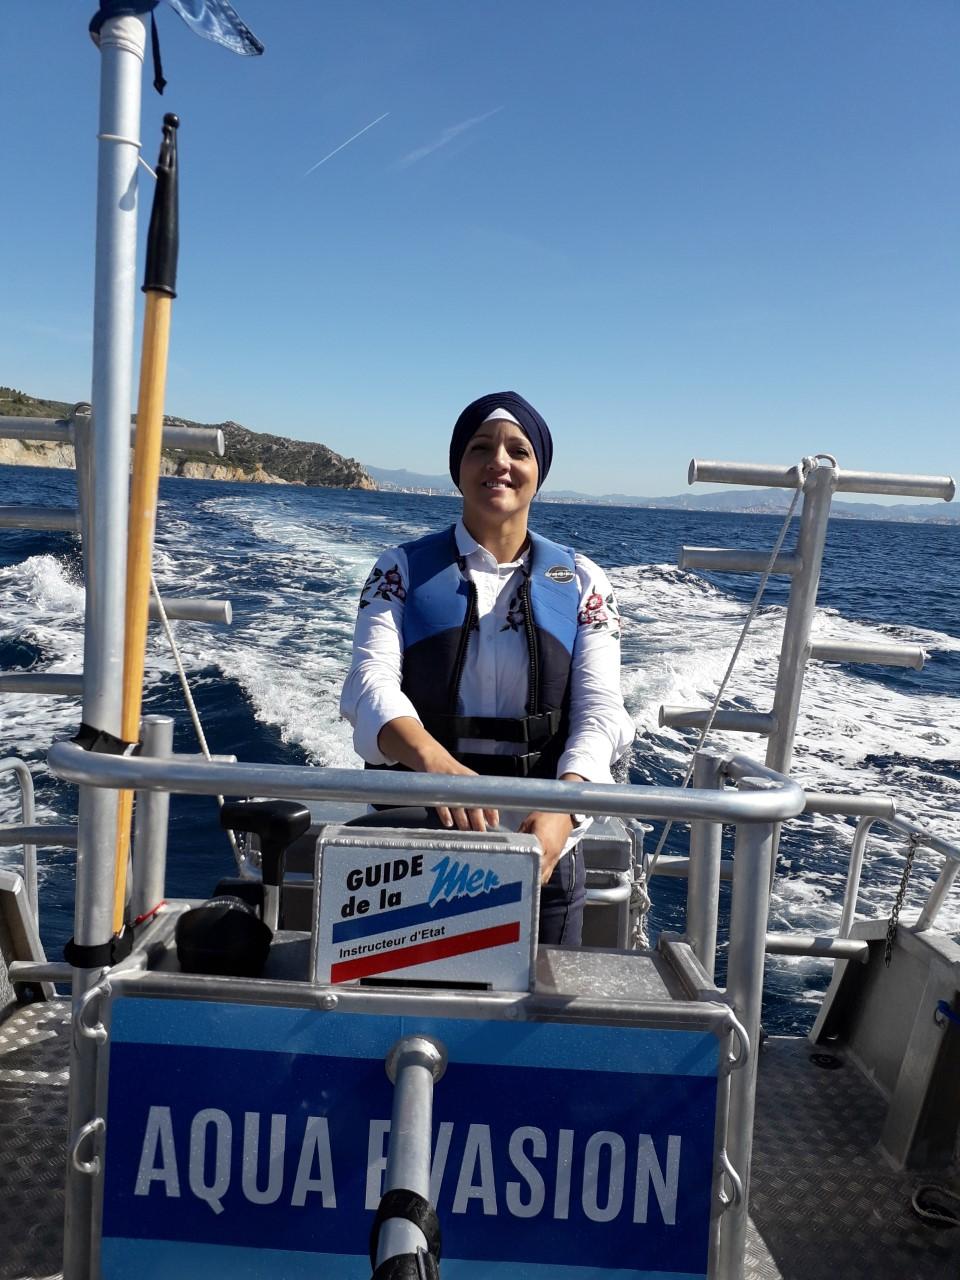 https://www.aqua-evasion.com/medias/images/permis-bateau-a-marseille-1.jpg